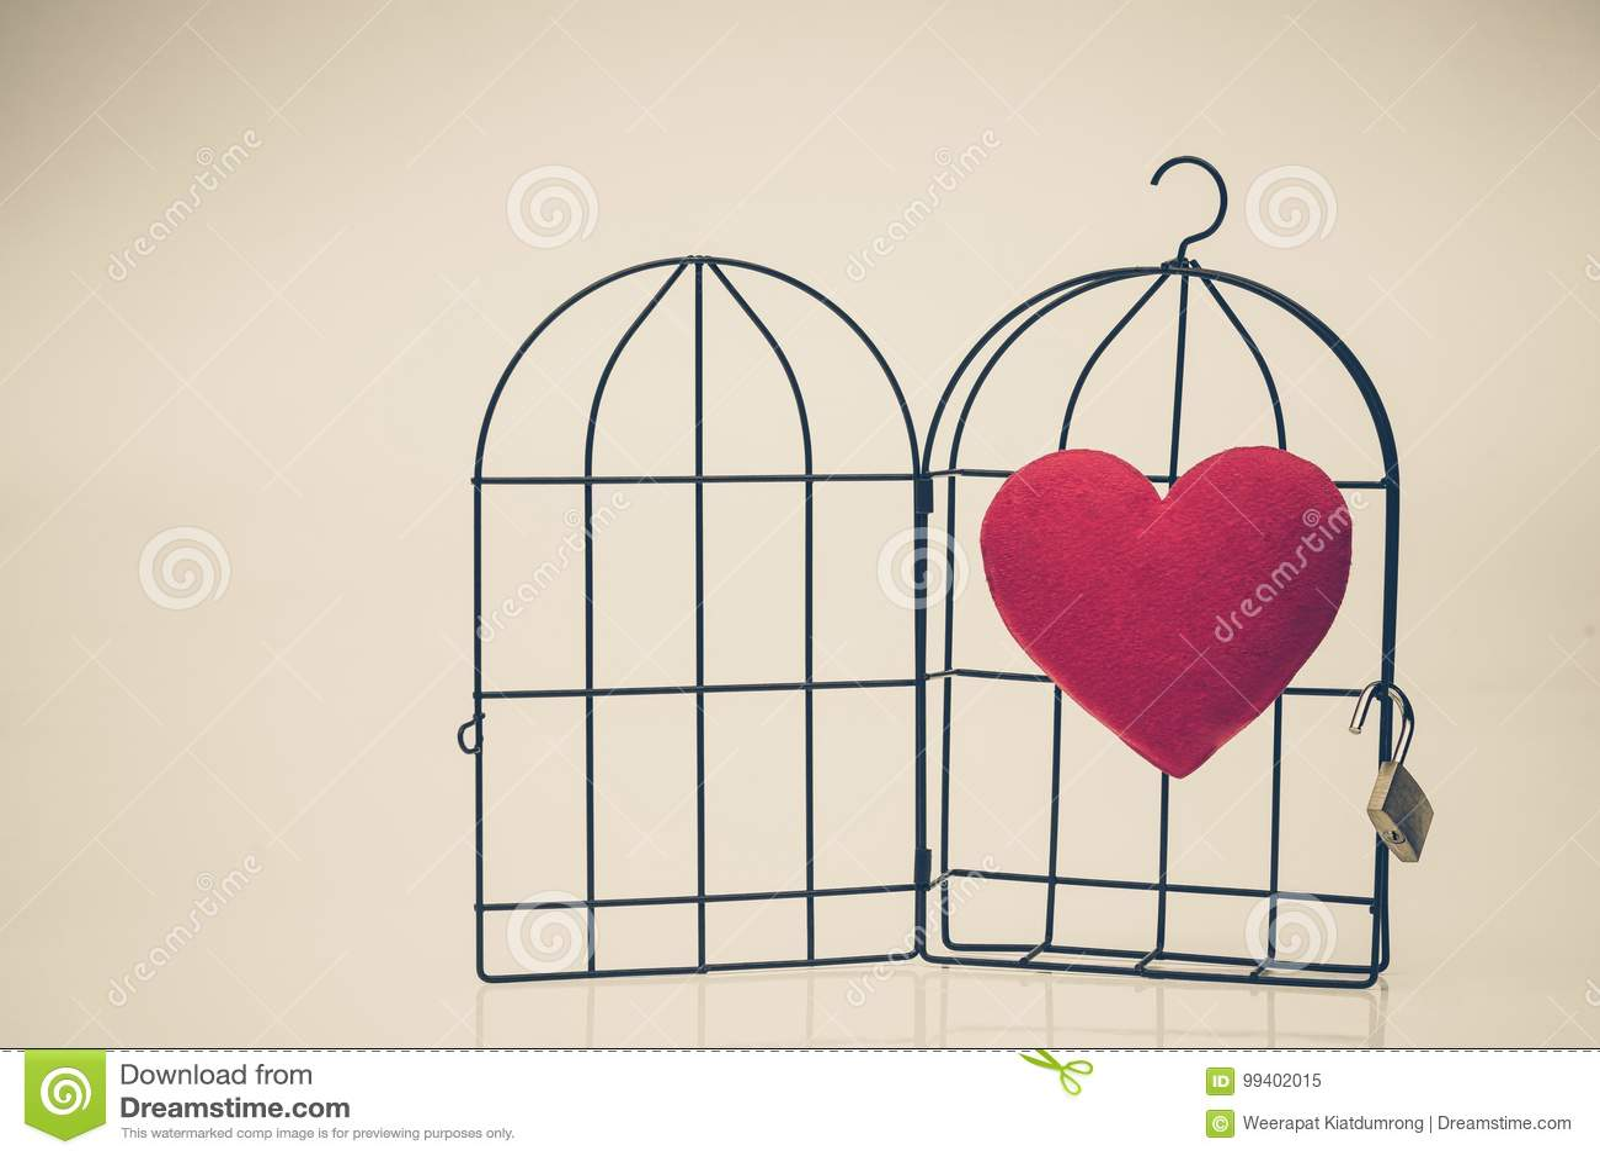 Herz Liebes Rahmen Stock Photos - Royalty Free Pictures